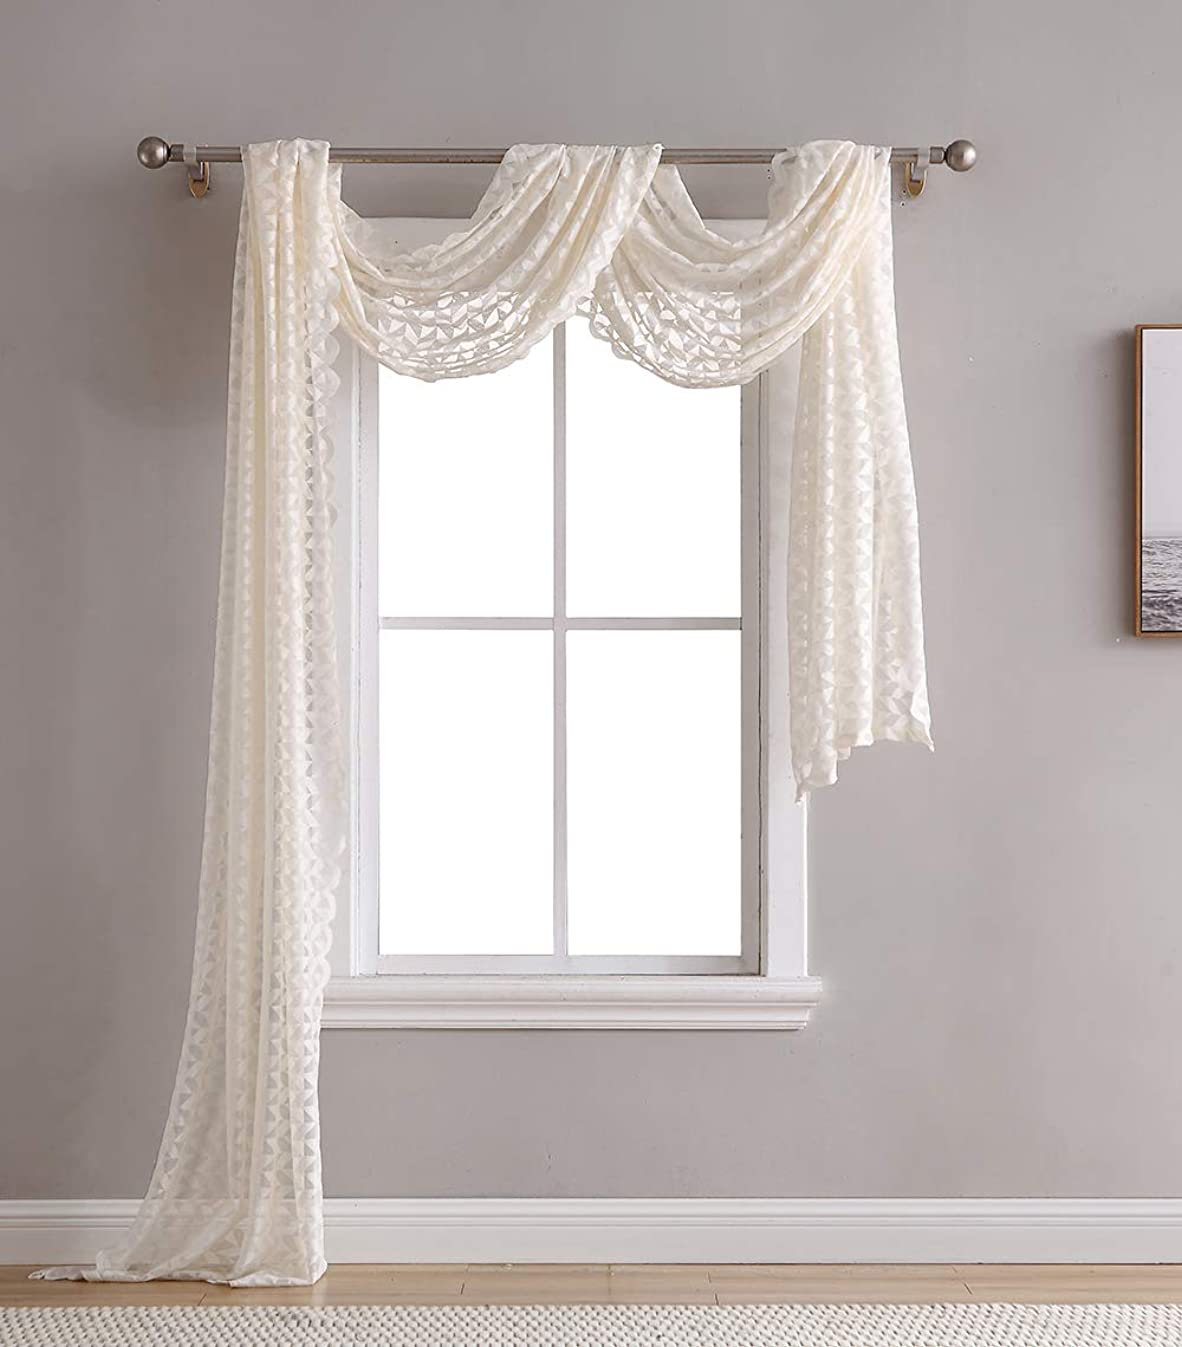 HLC.ME Herringbone Lace Sheer Window Curtain Scarf - Valance - 40